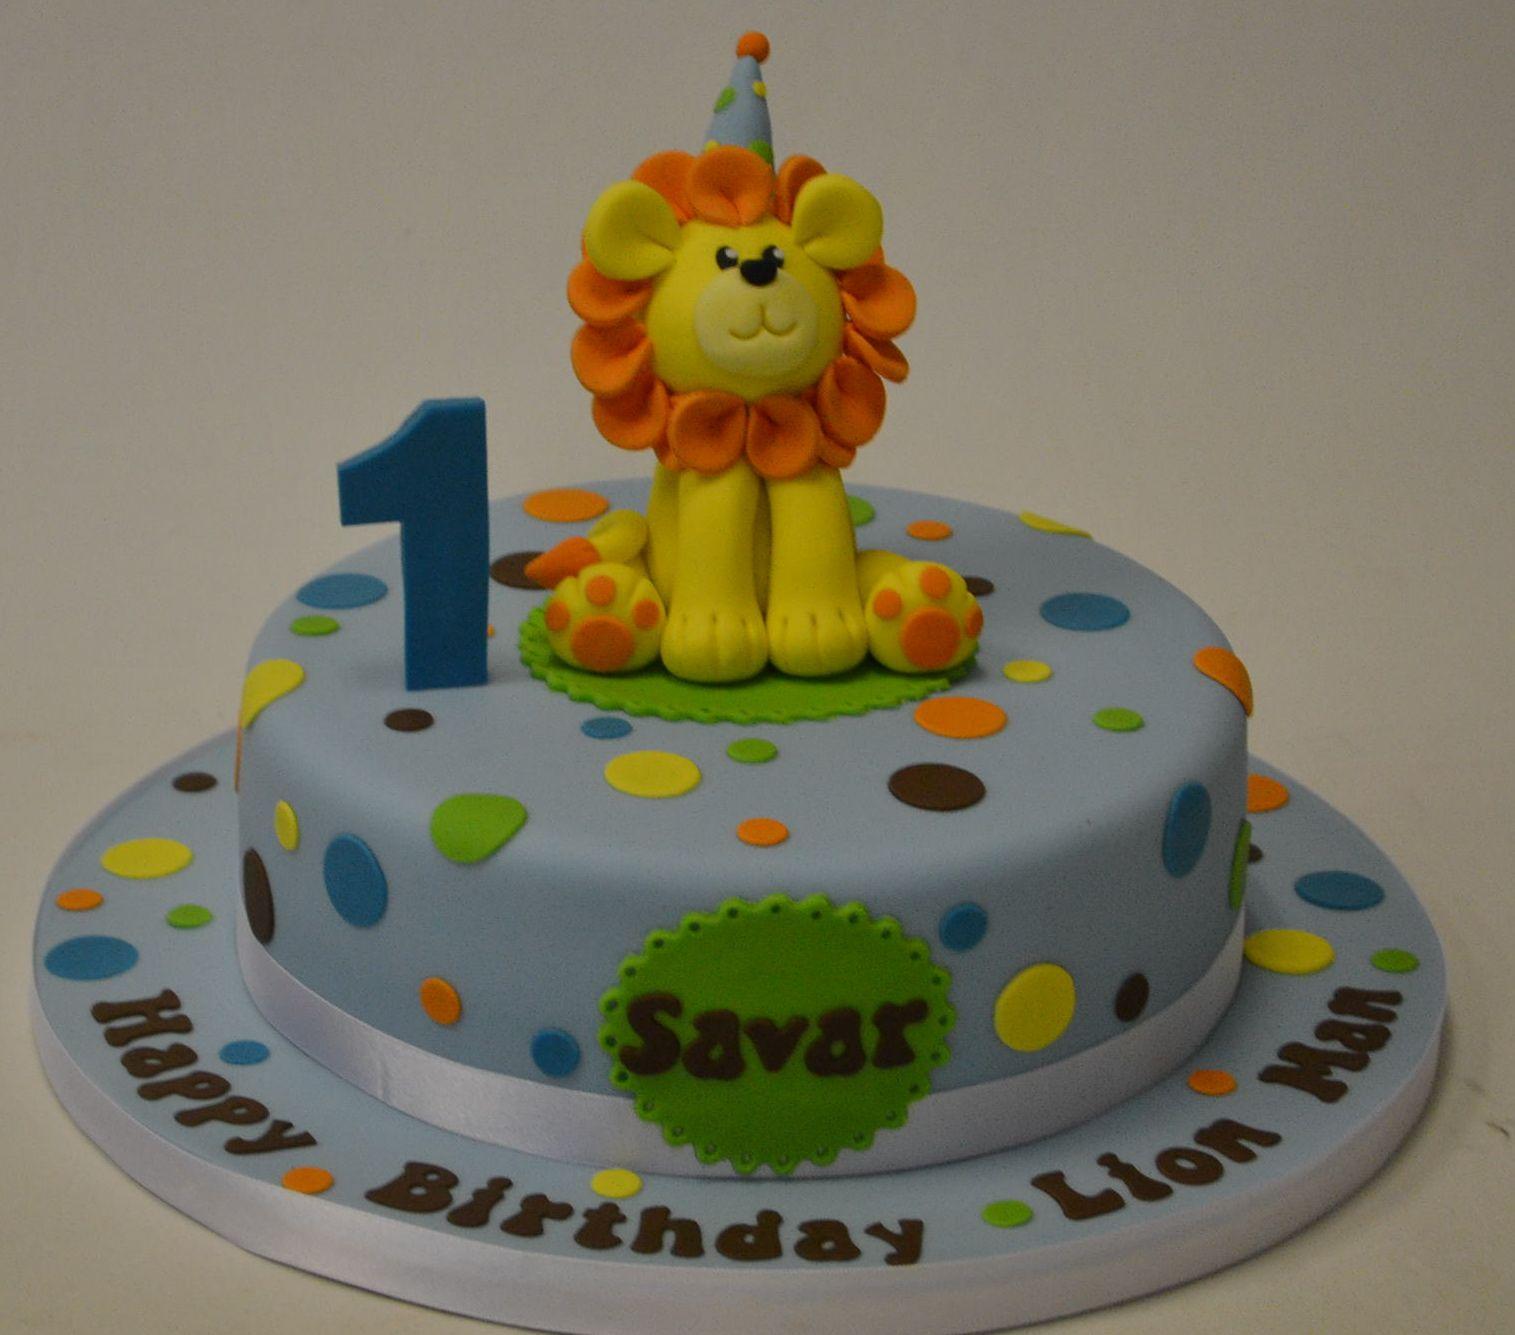 First Birthday Lion Cake Home  Cake Gallery  Baby  St - Lion birthday cake design